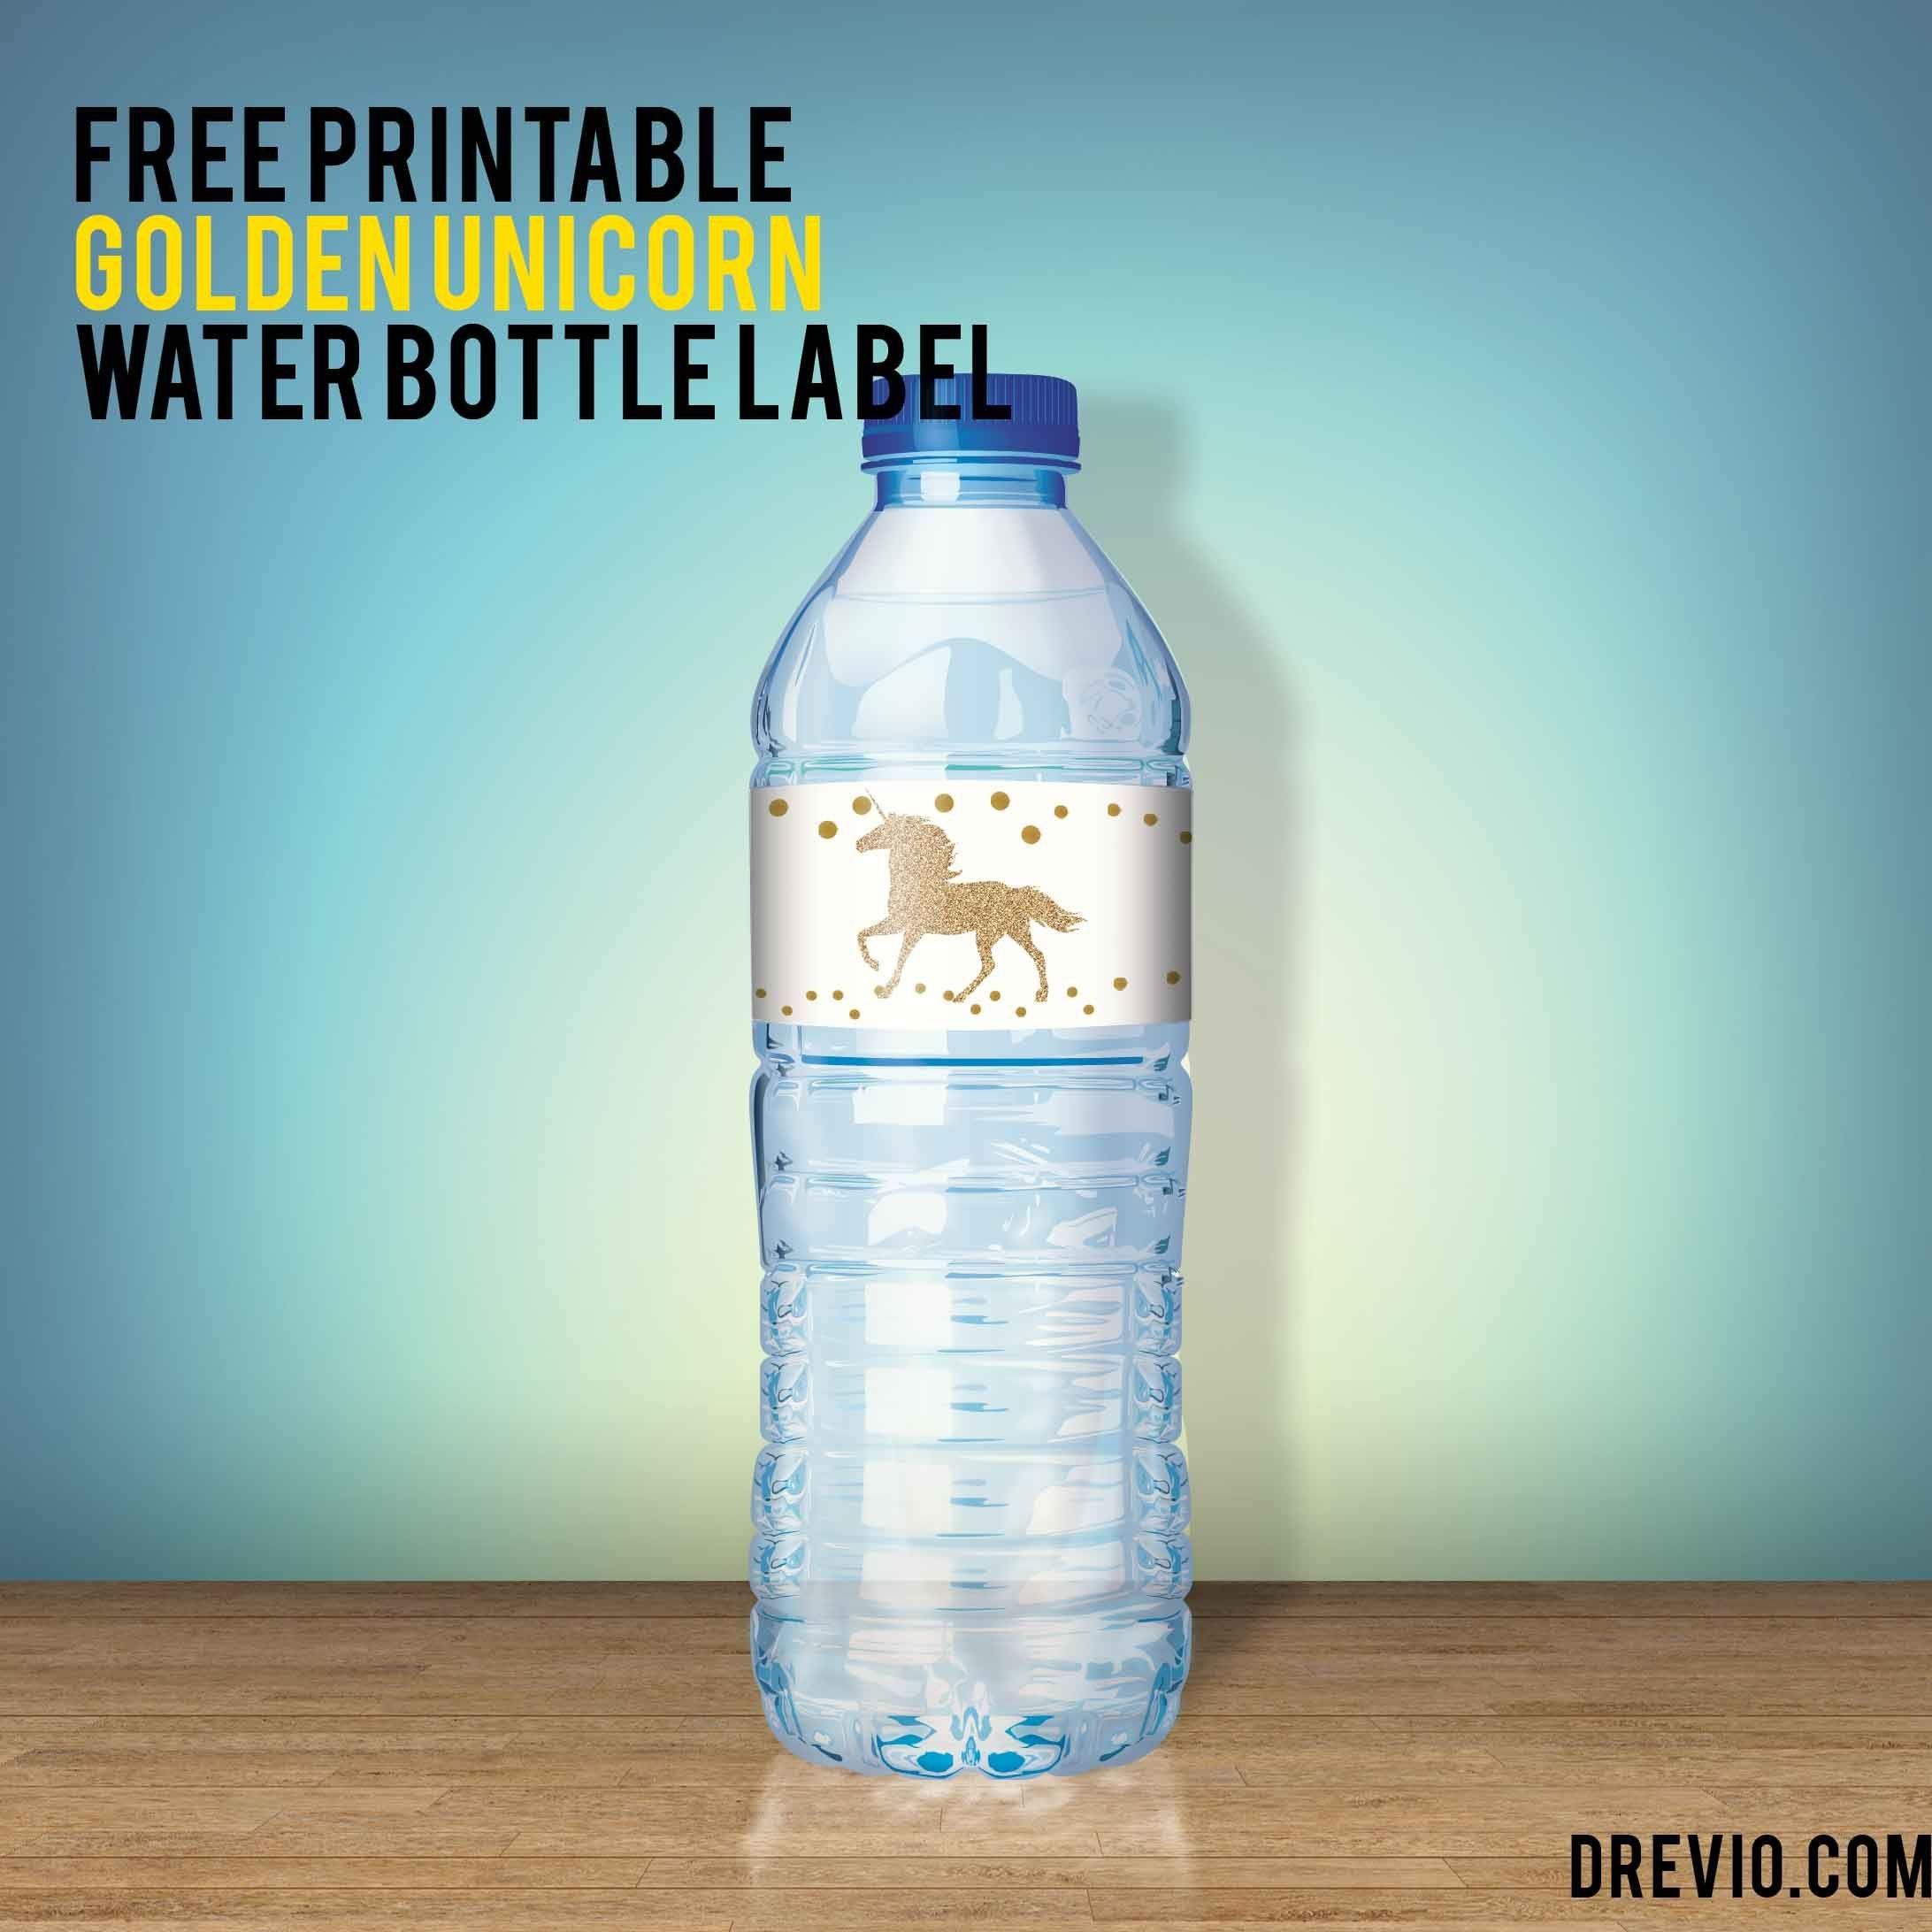 Free Unicorn Water Bottle Label -   Free Printable Birthday - Free Printable Water Bottle Labels For Birthday